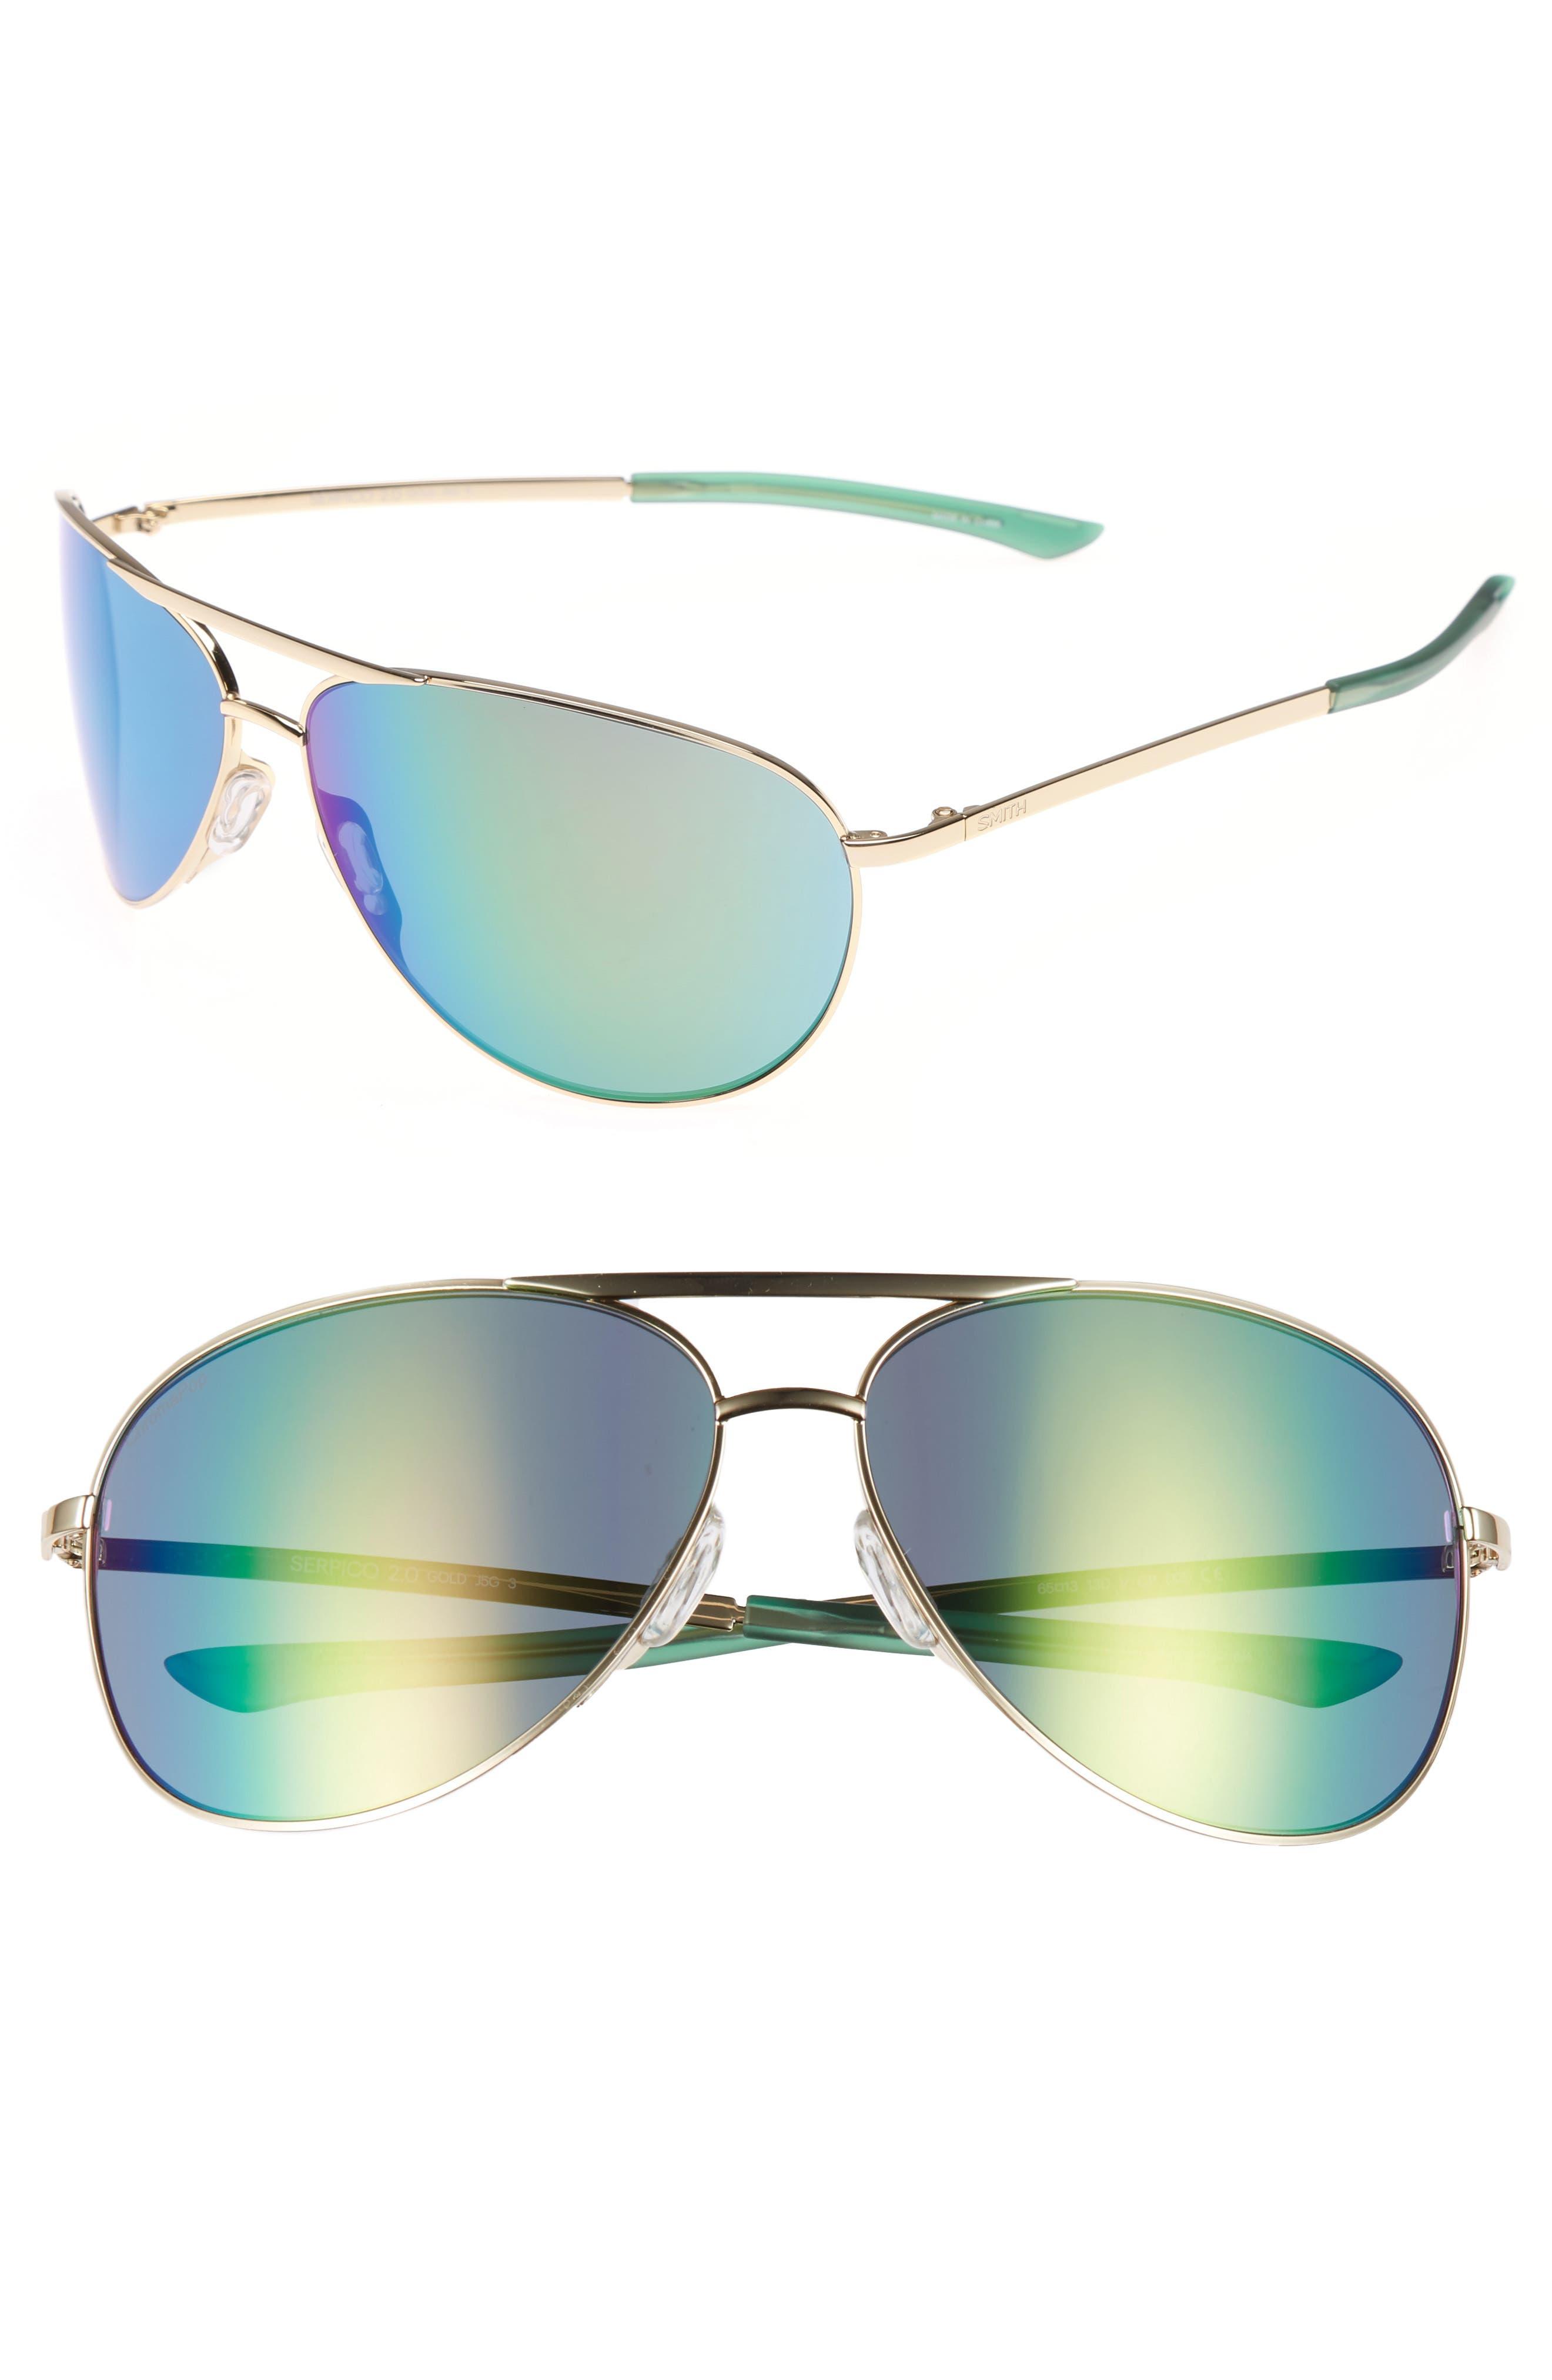 Serpico 2 65mm Mirrored ChromaPop<sup>™</sup> Polarized Aviator Sunglasses,                             Main thumbnail 1, color,                             Gold/ Green Mirror